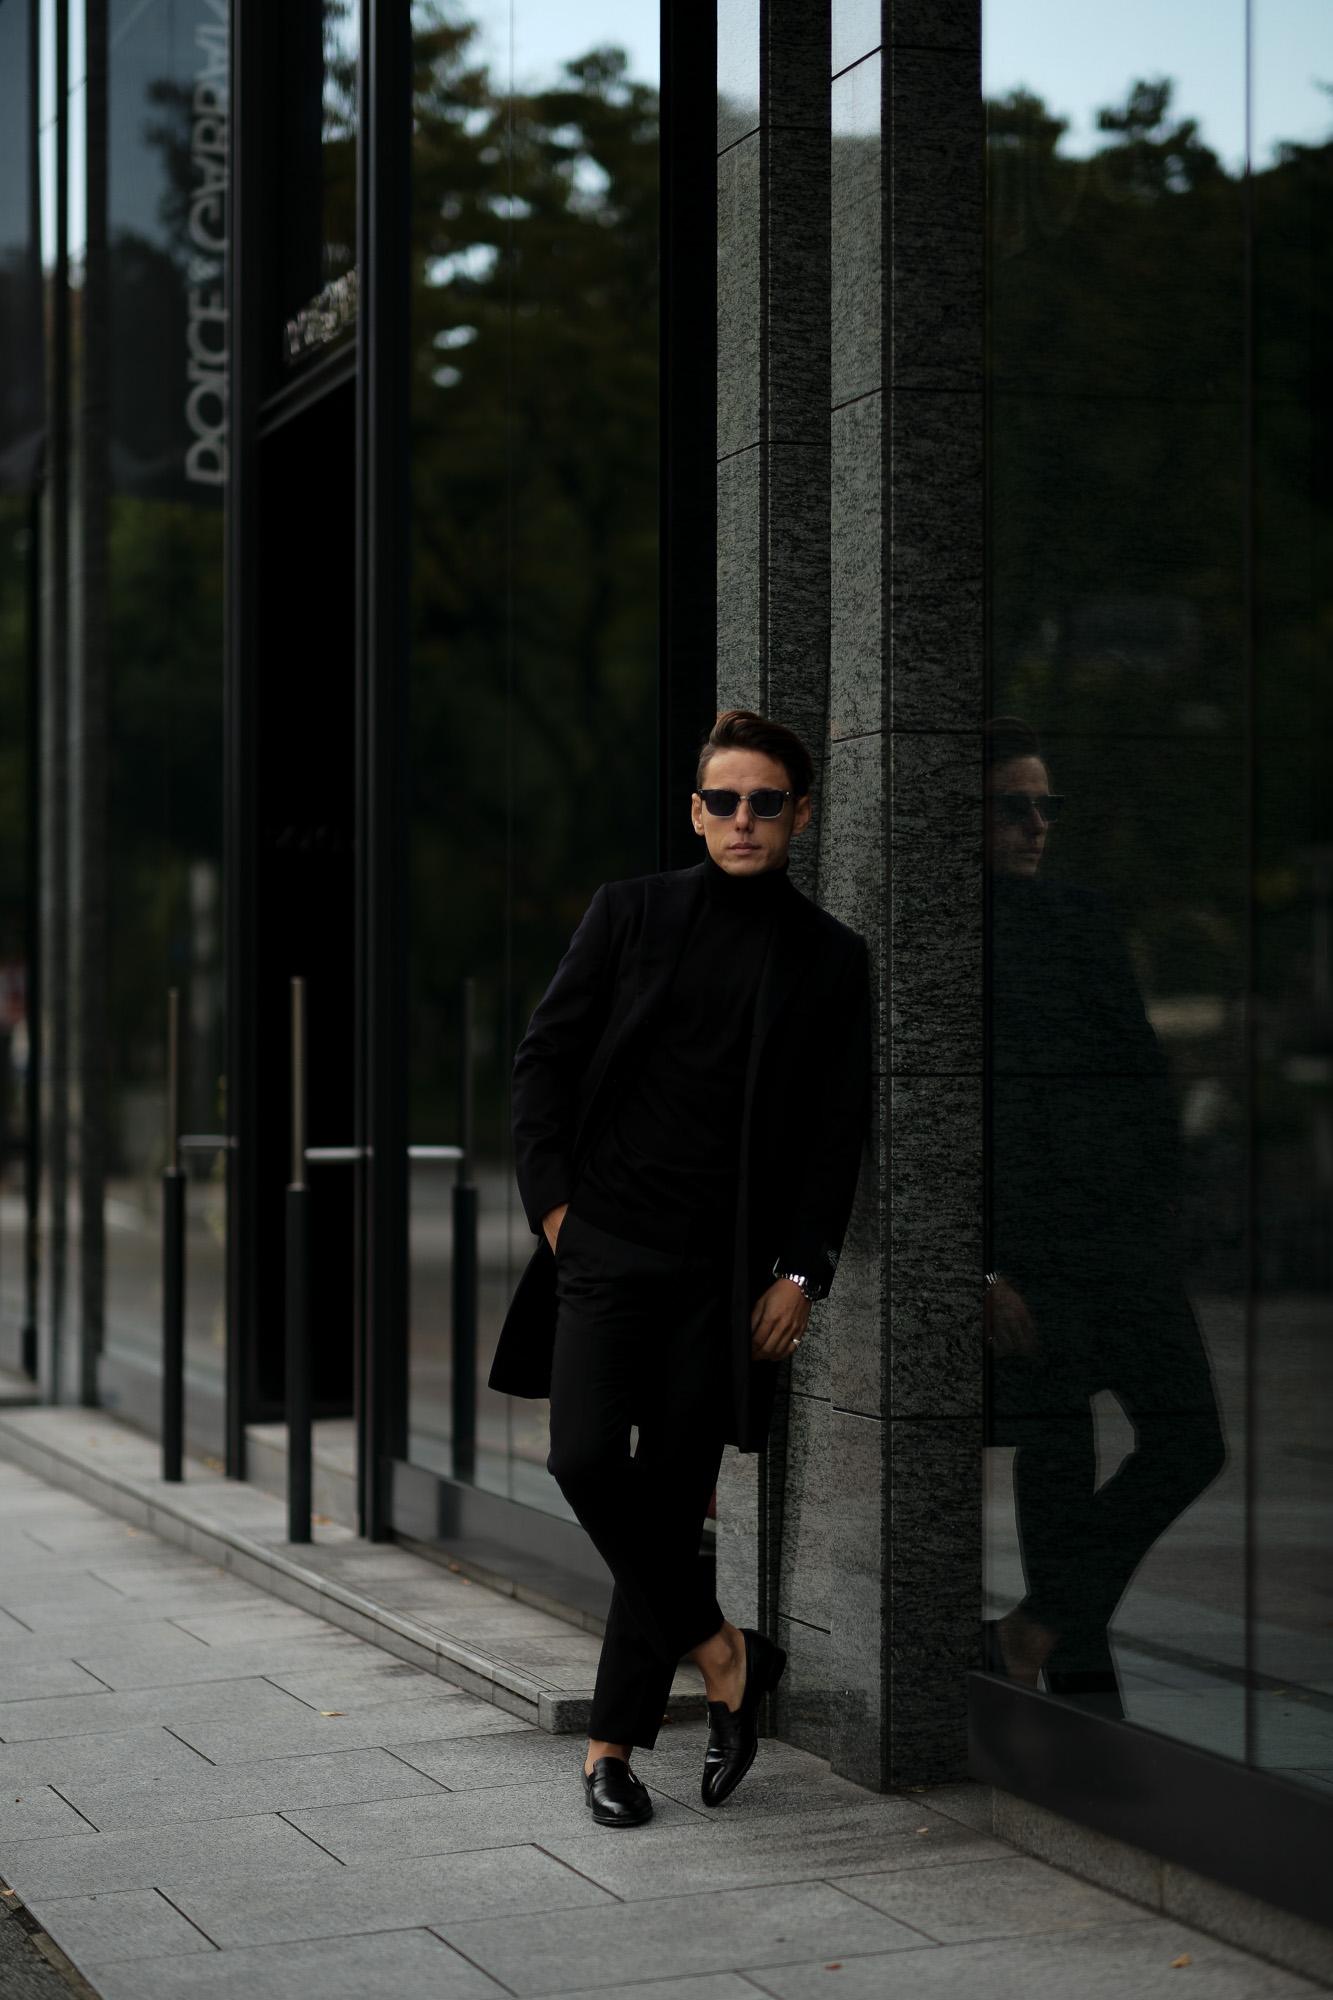 BELVEST ベルベスト Cashmere Chester coat カシミア シングルチェスターコート NAVY ネイビー Made in italy イタリア製 2020 秋冬新作 【Special Model】愛知 名古屋 Alto e Diritto アルトエデリット カシミヤコート カシミアコート